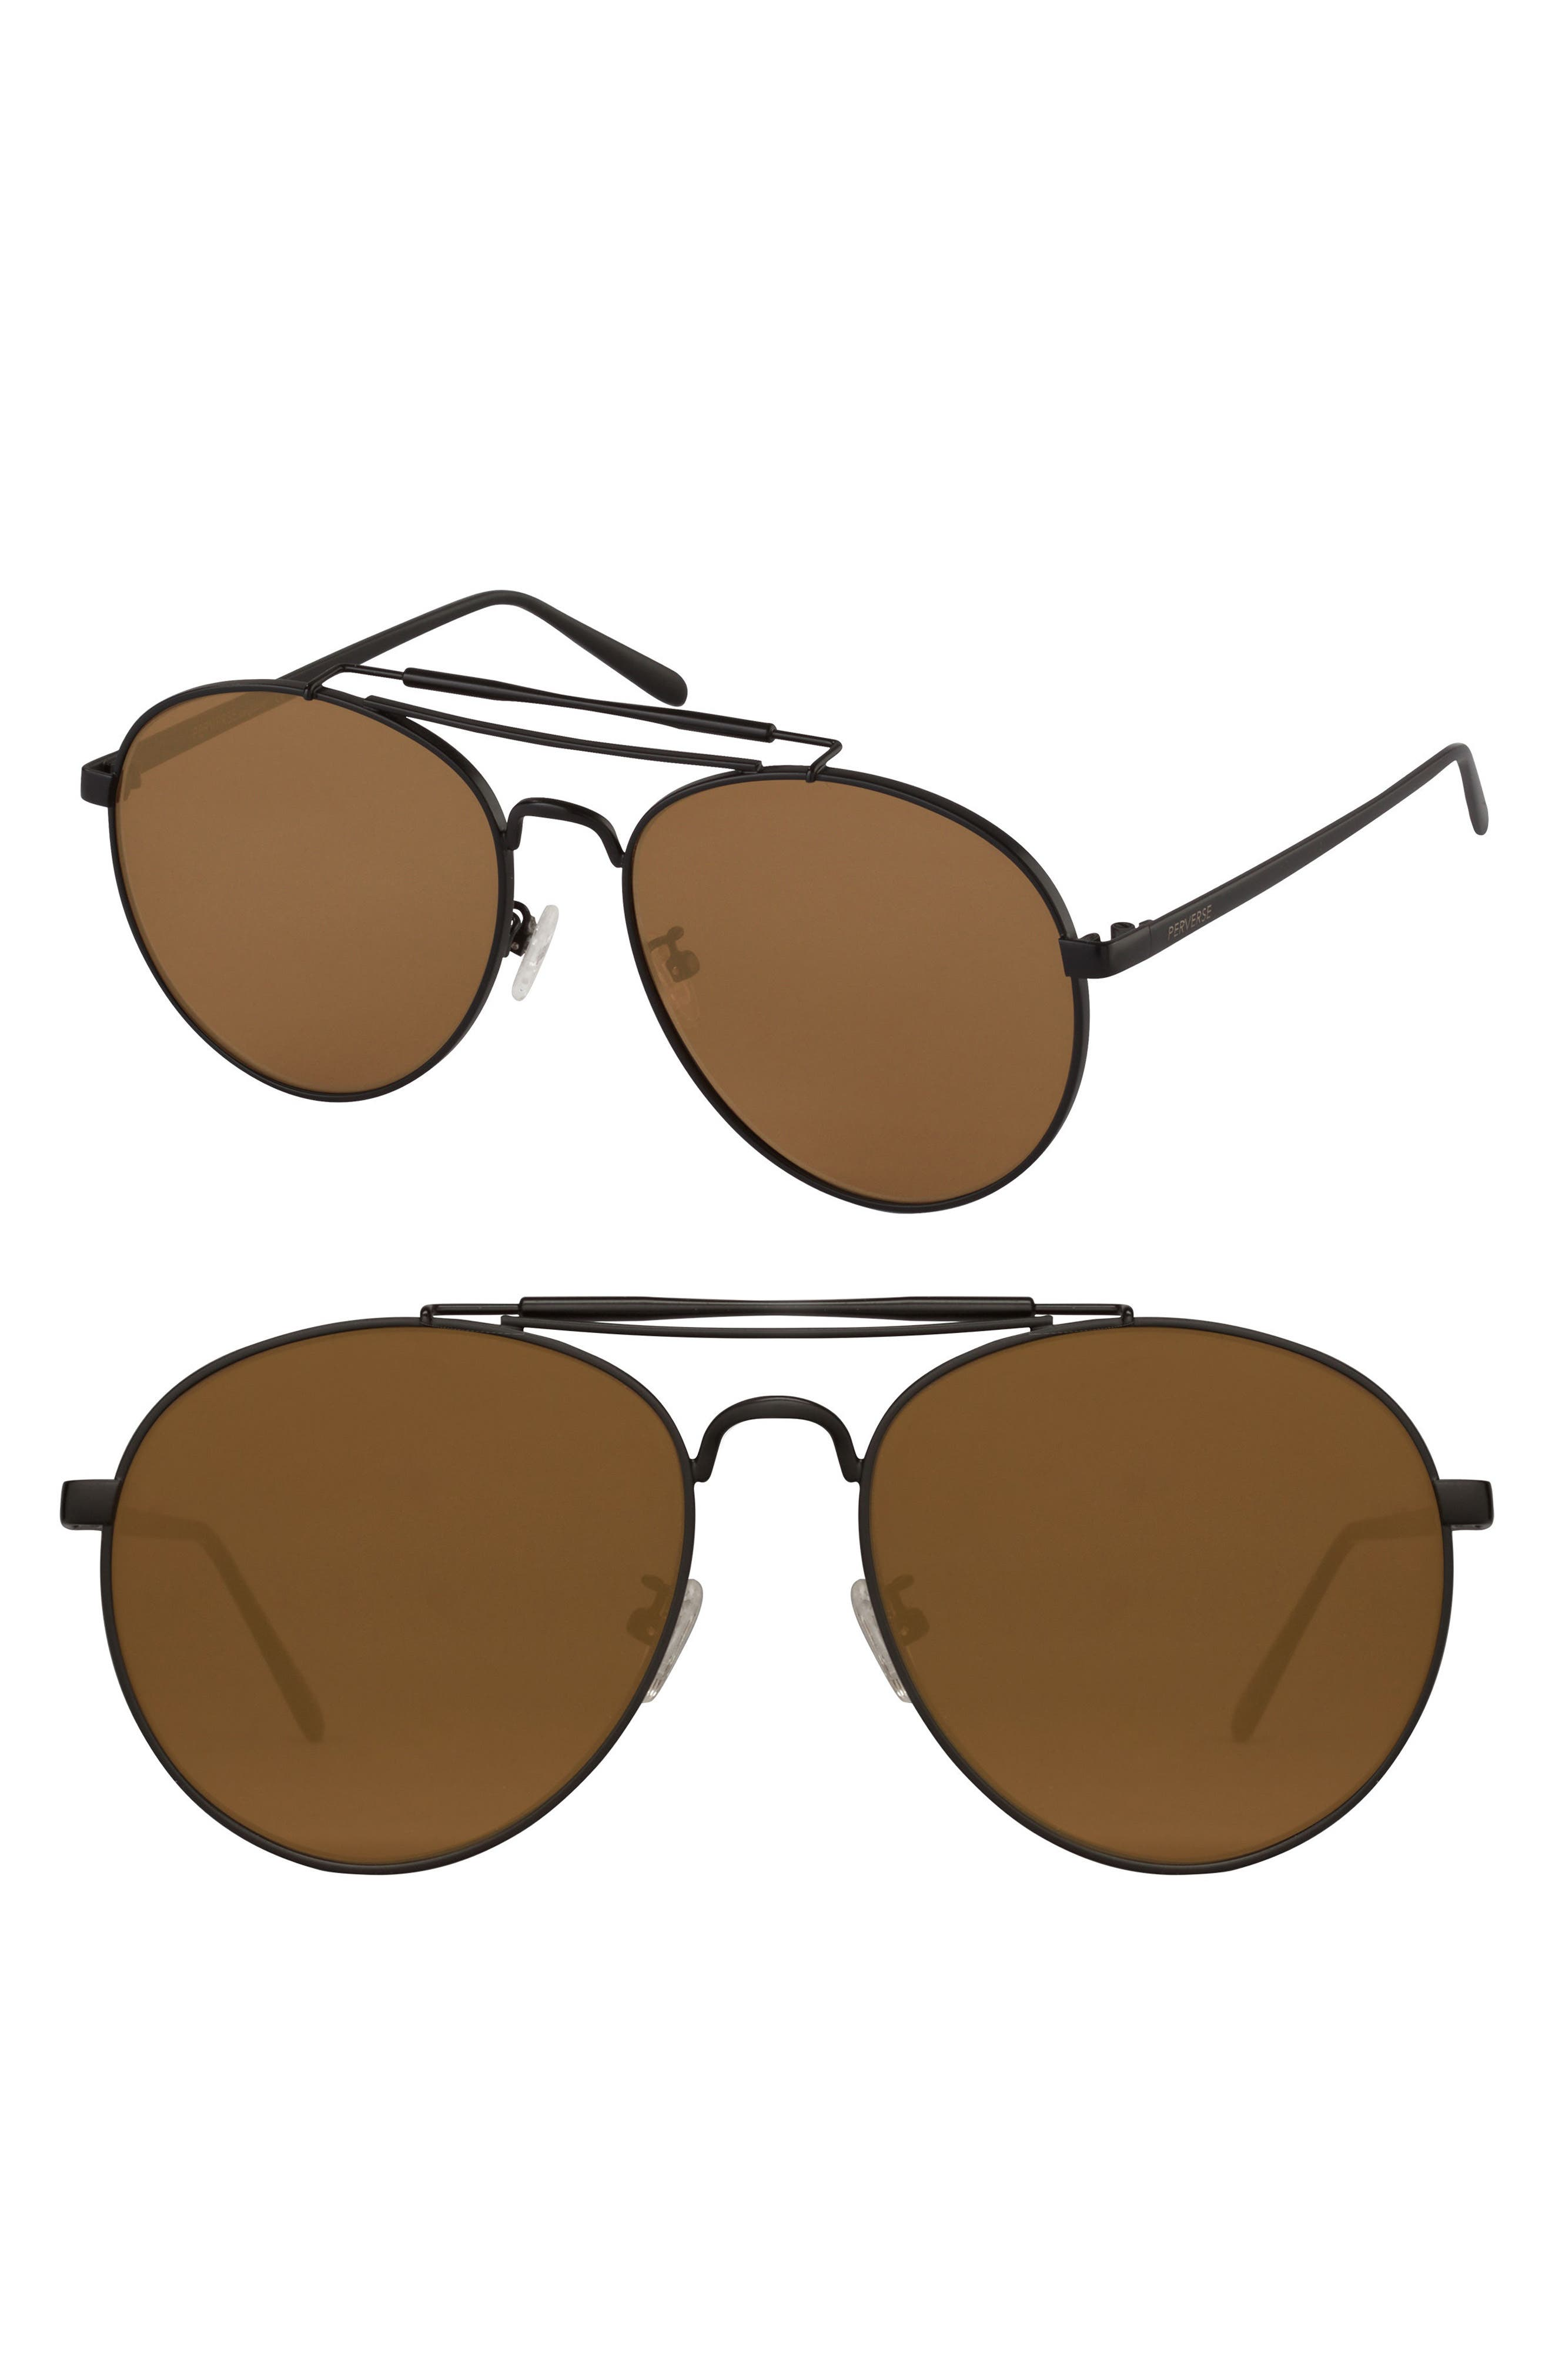 50mm Aviator Sunglasses,                             Main thumbnail 1, color,                             001